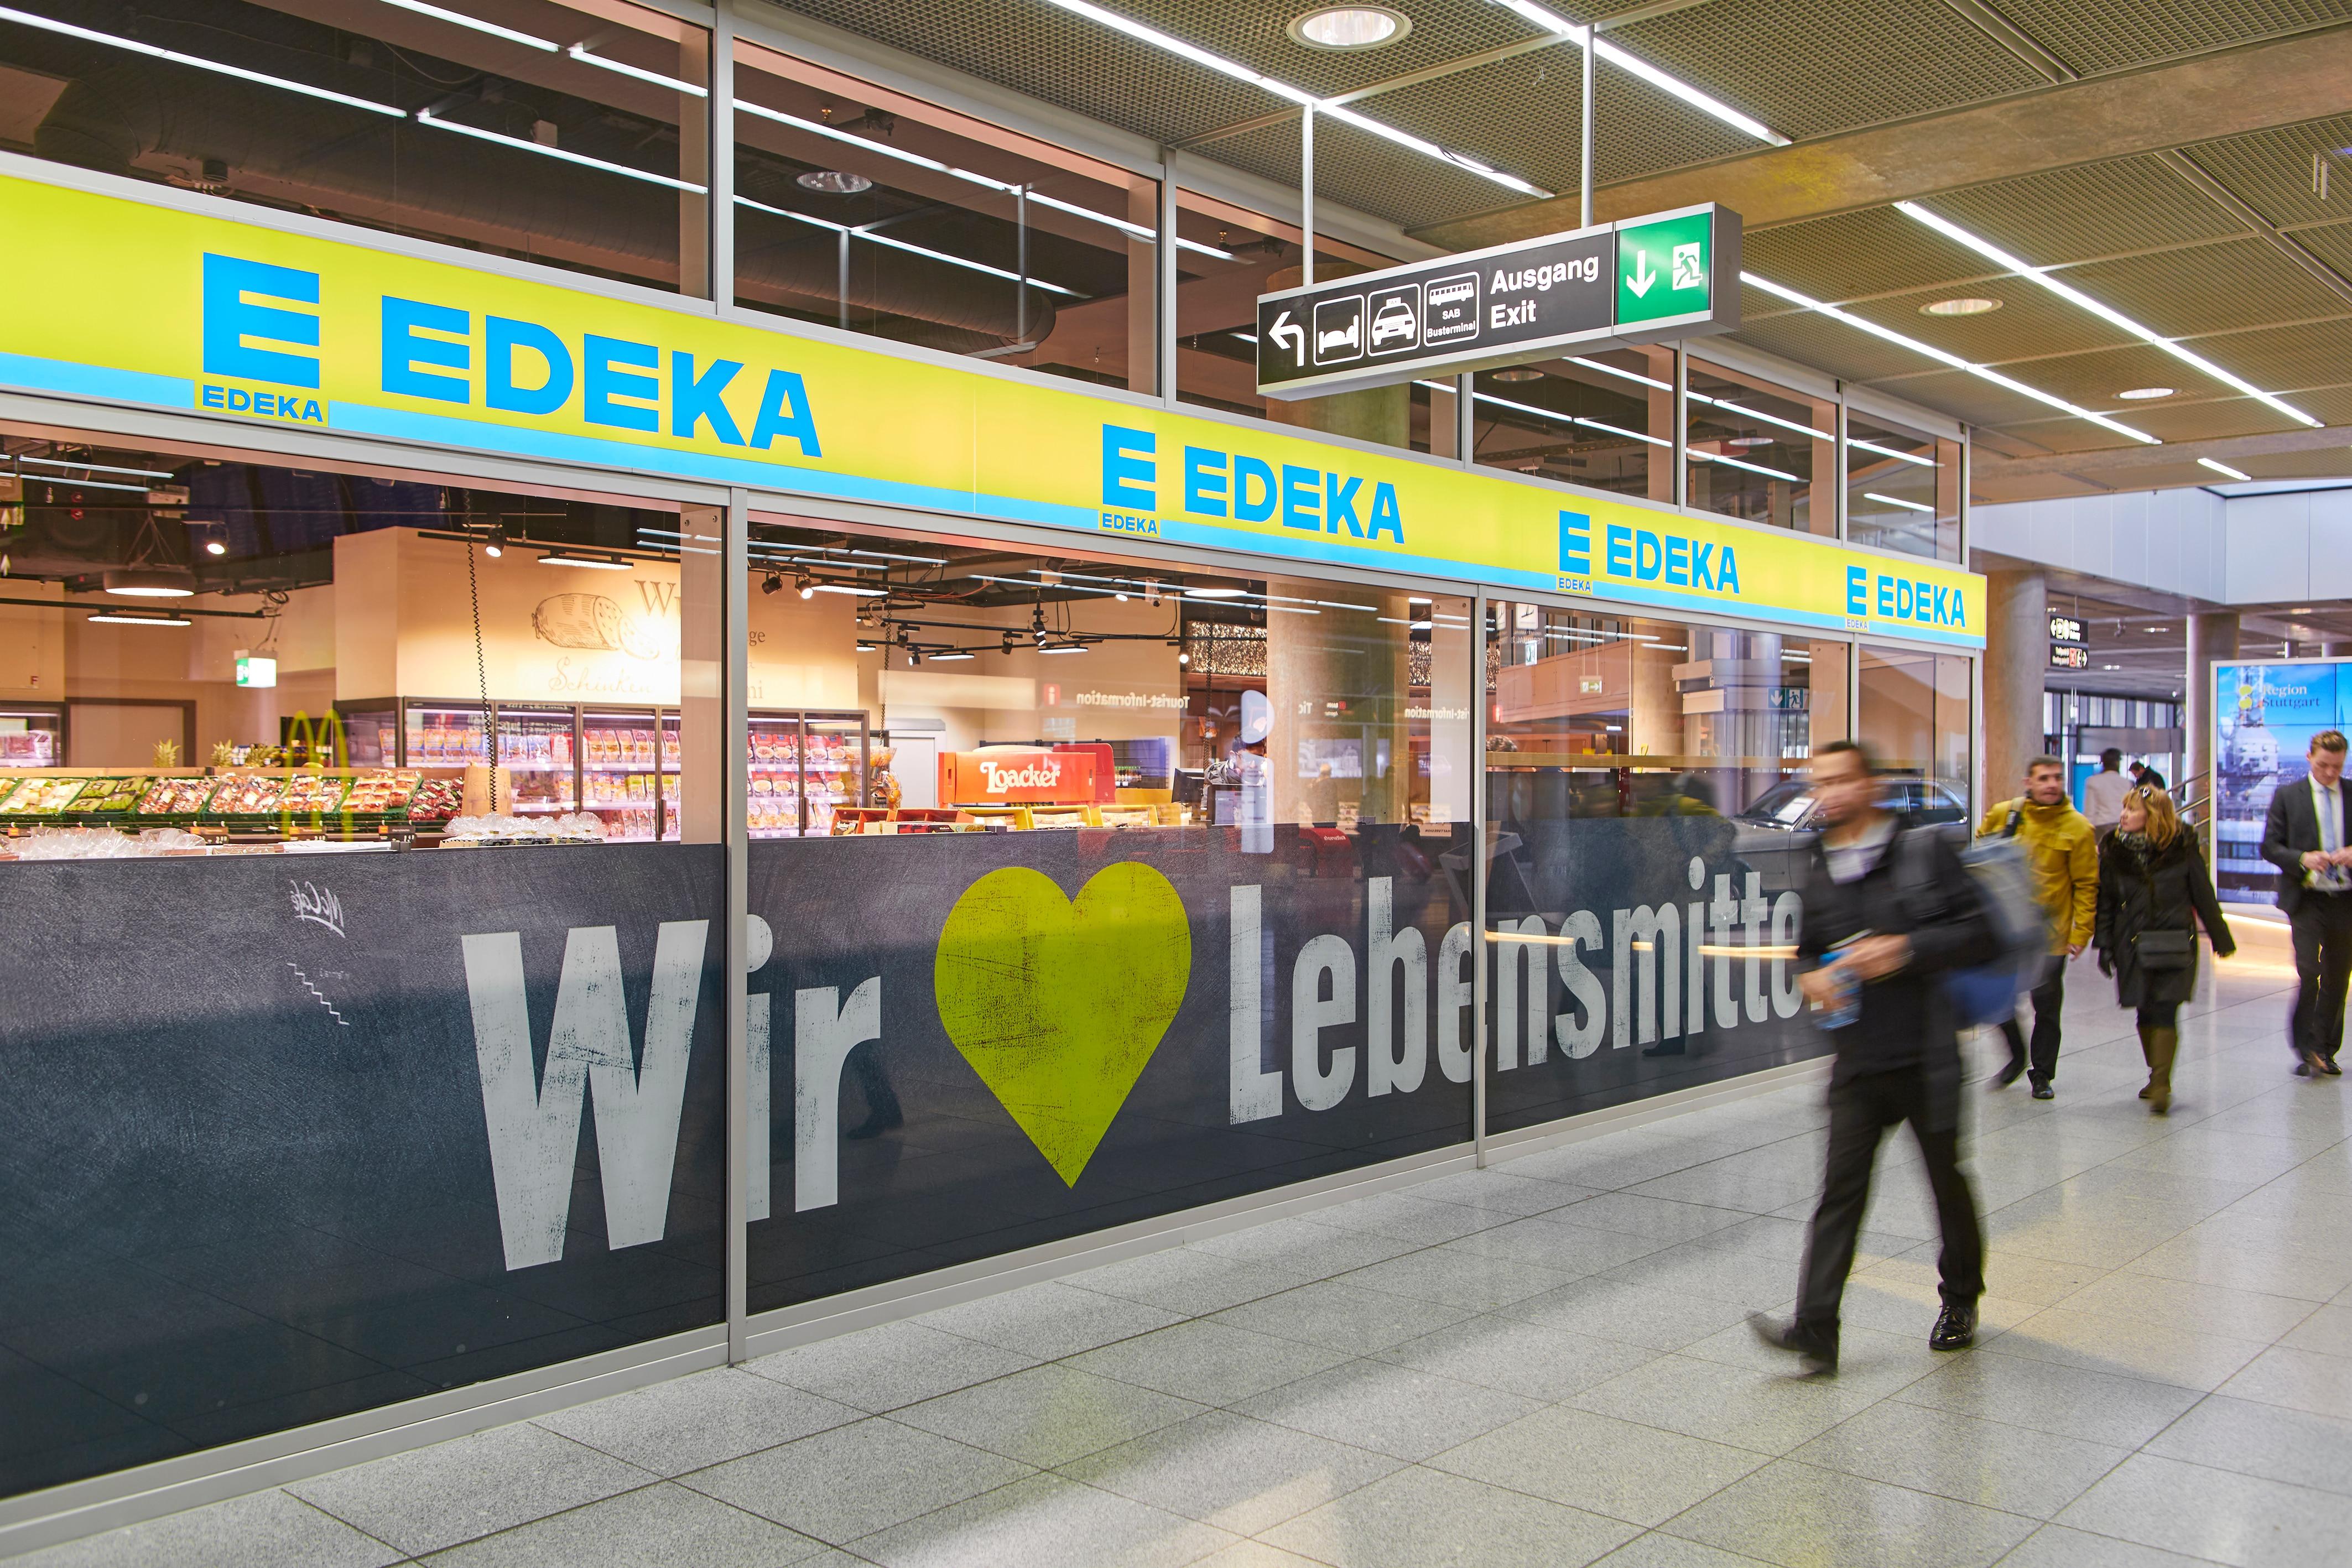 Eröffnet Edeka eigene Bio-Läden?